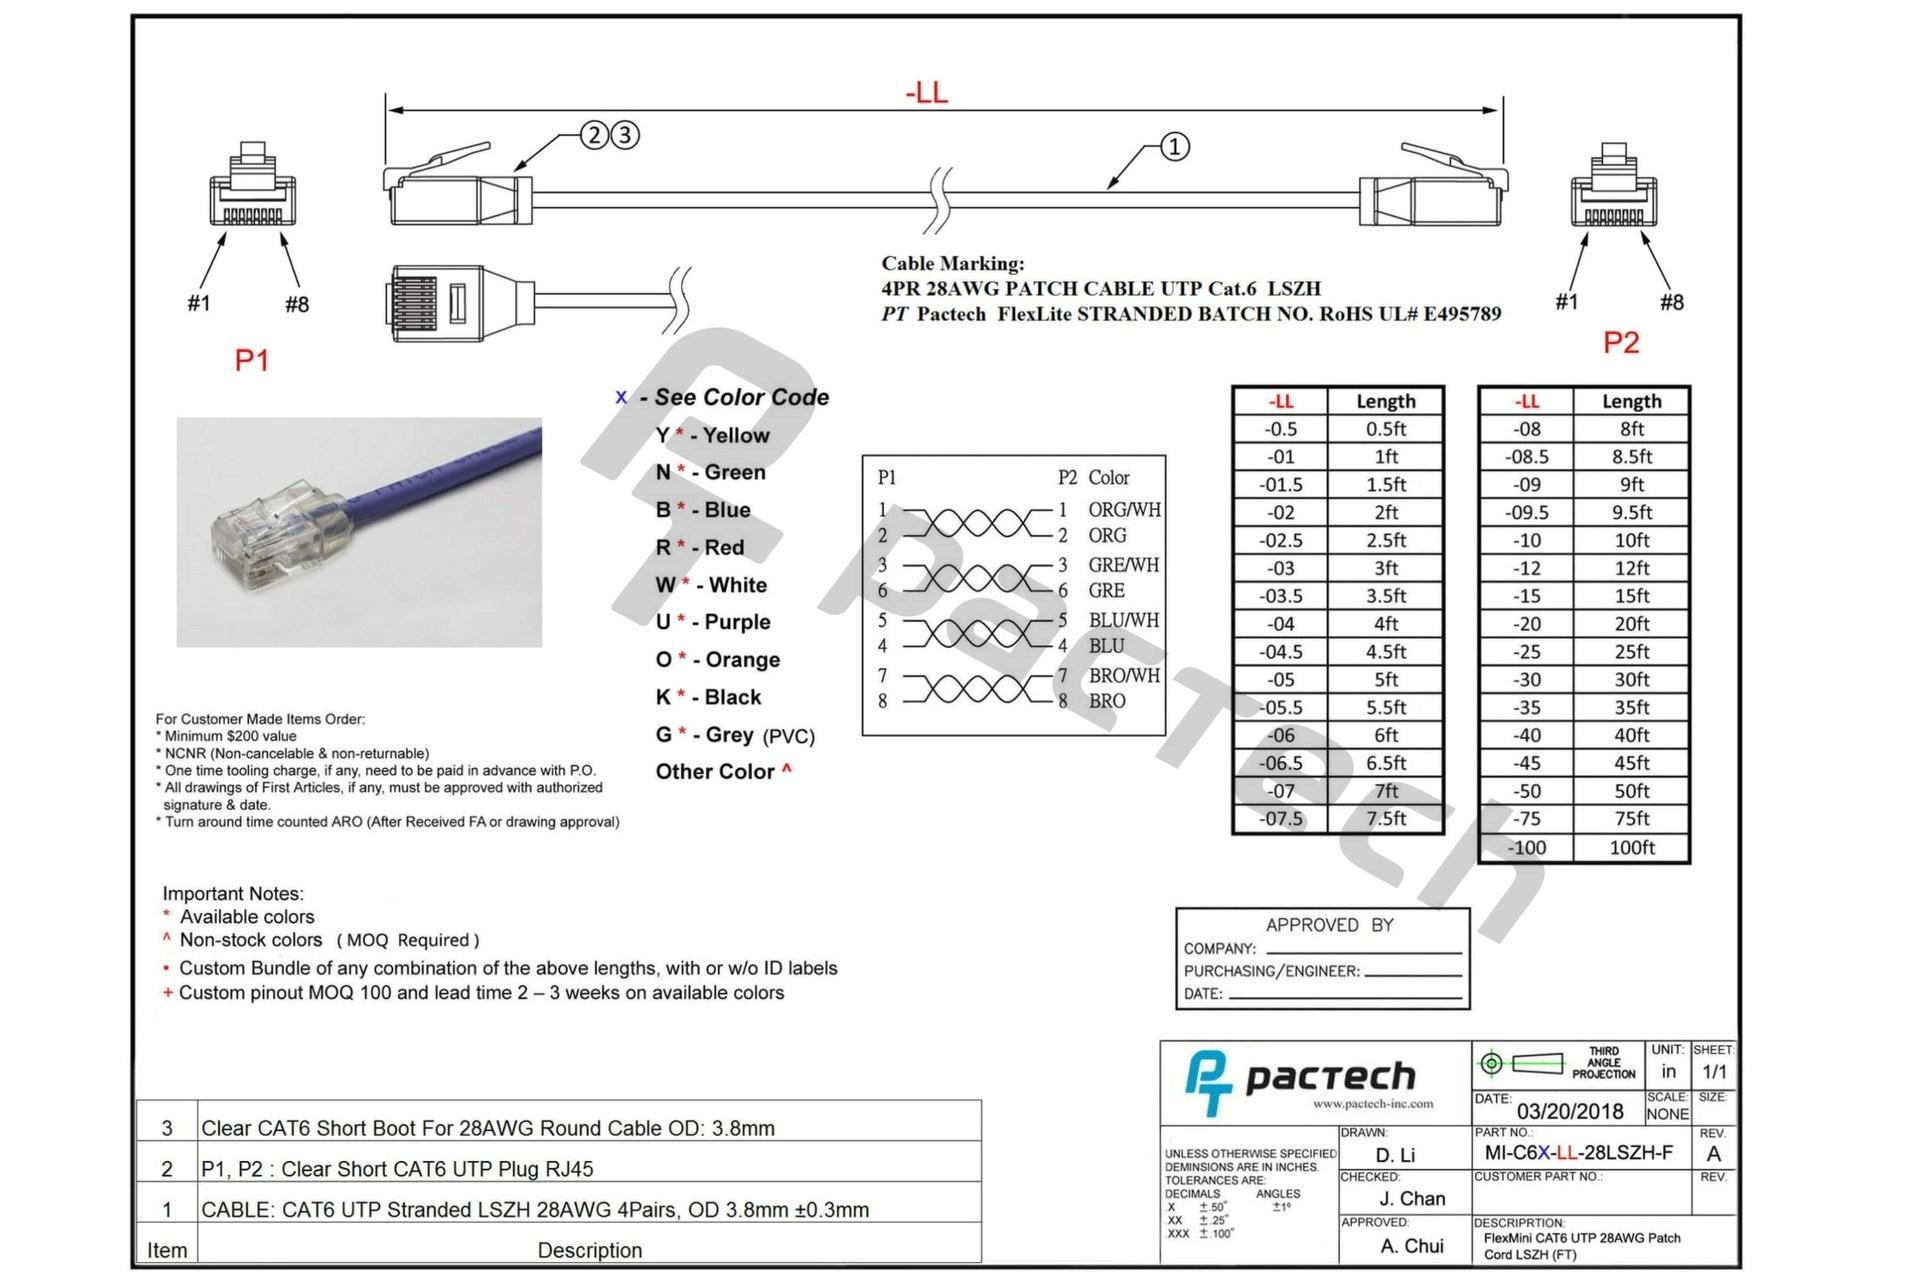 cat5e wiring jack diagram wiring diagram databasecat 5 wall jack wiring diagram